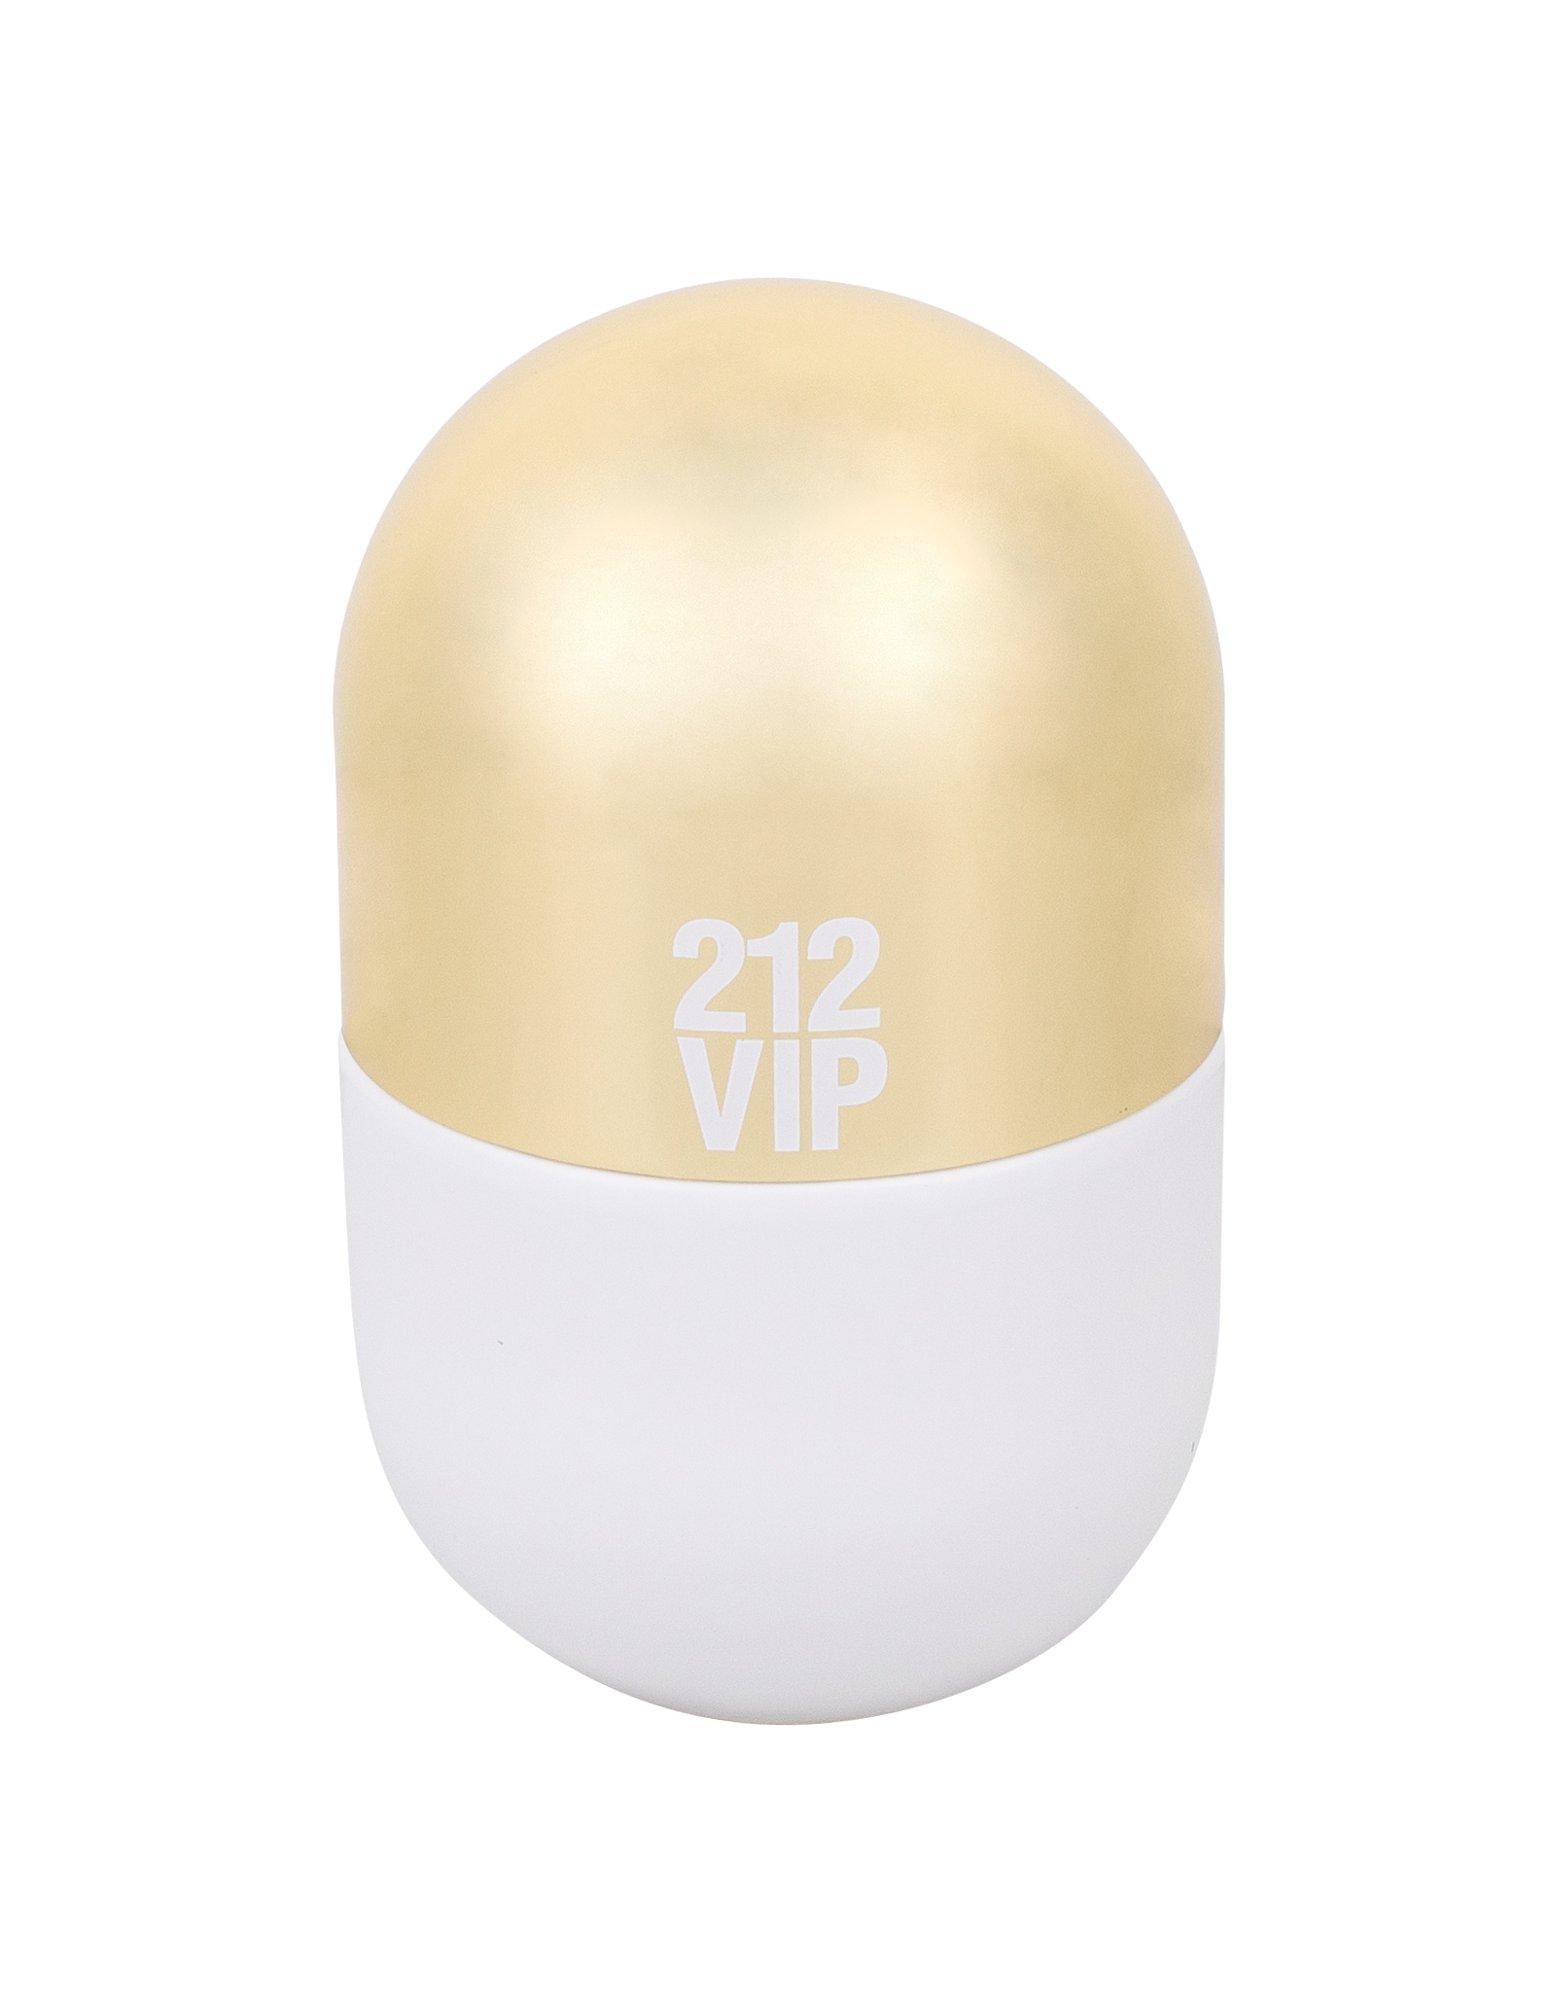 Carolina Herrera 212 VIP, Parfumovaná voda 20ml - tester